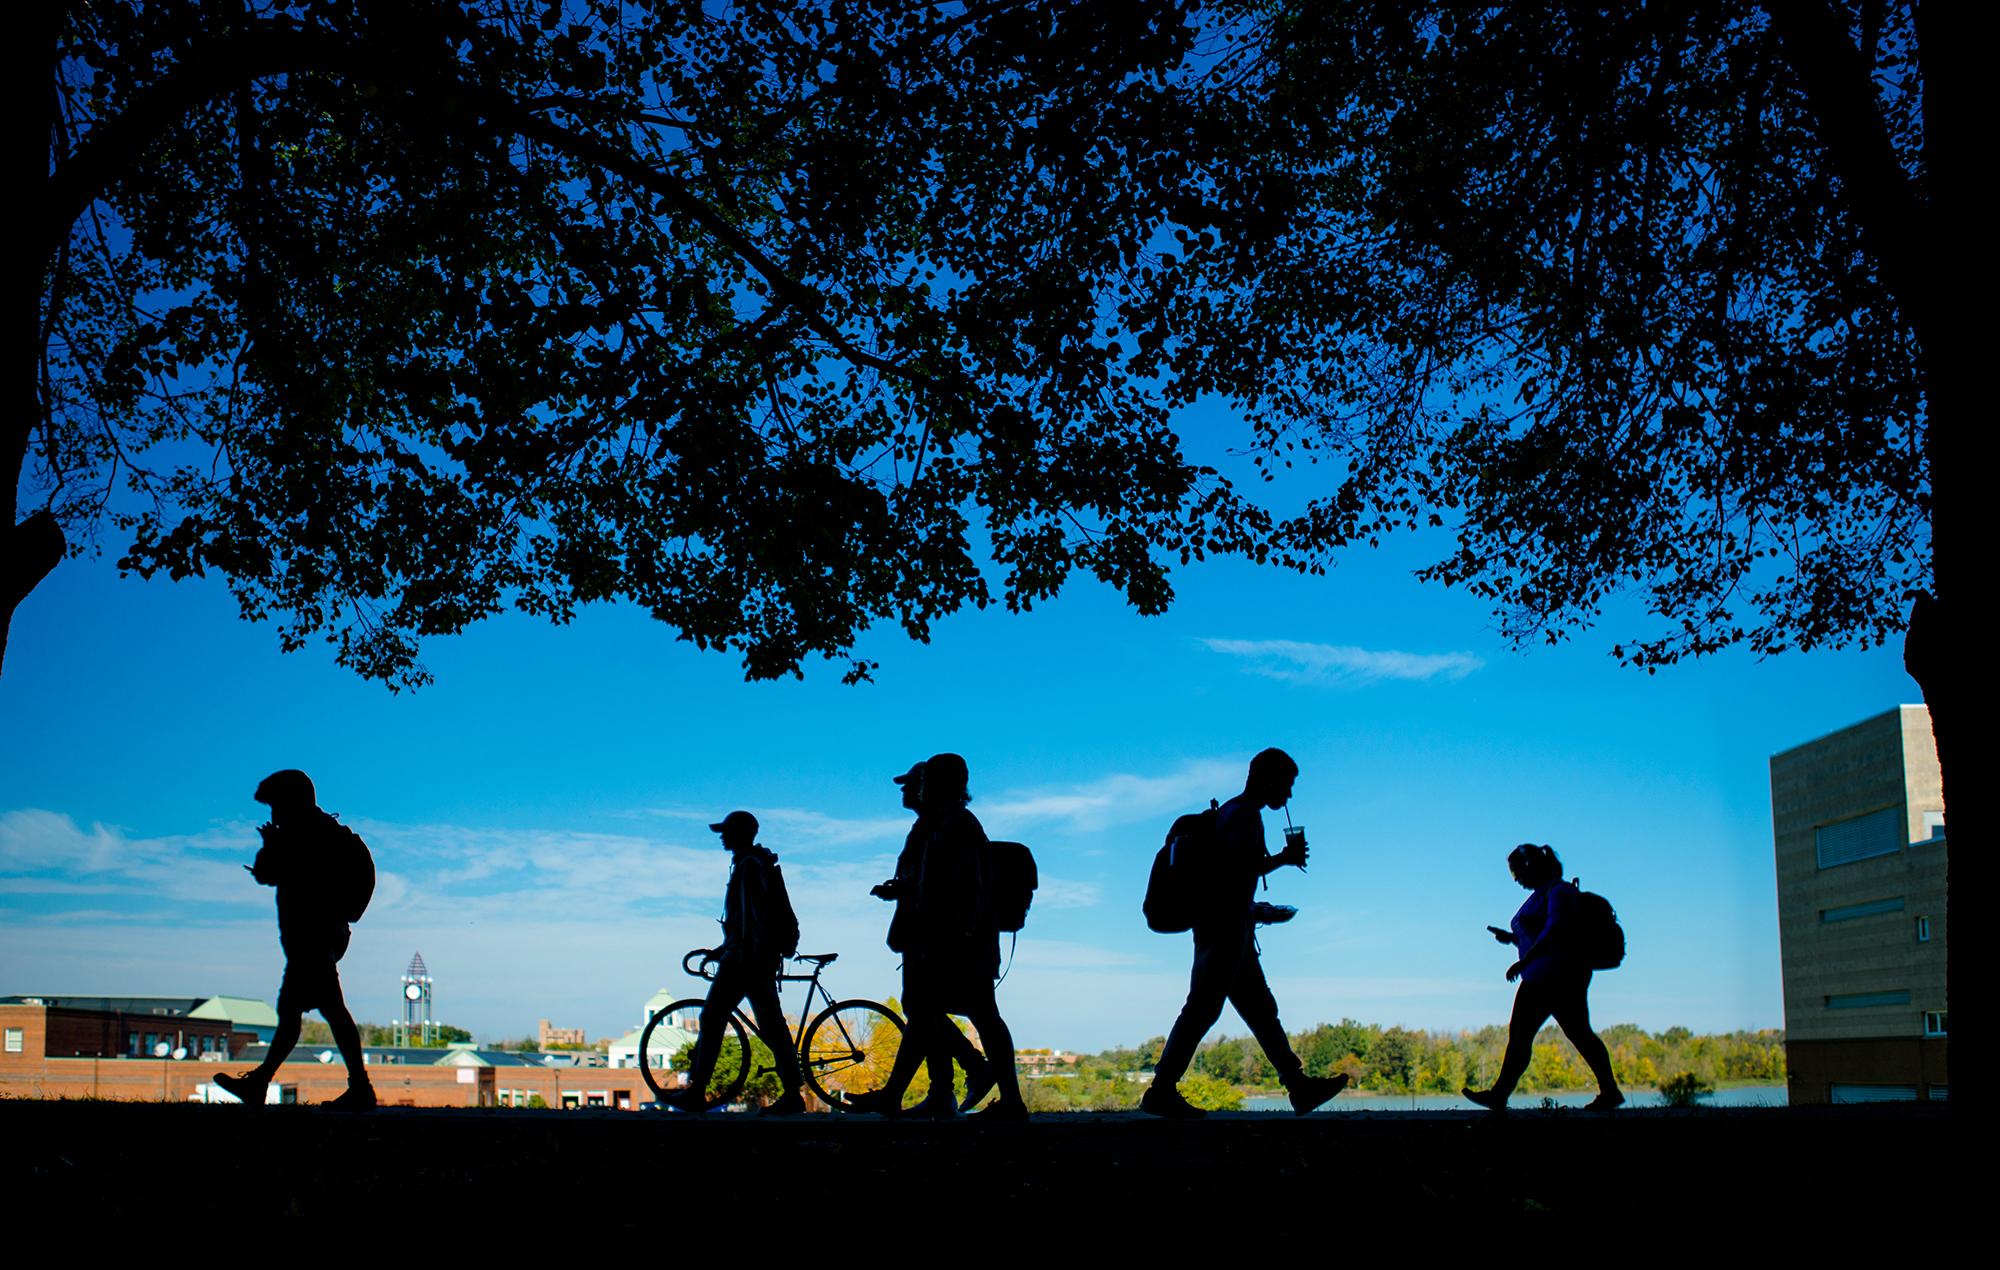 12 ways Buffalo is a great college town | Destination EDU